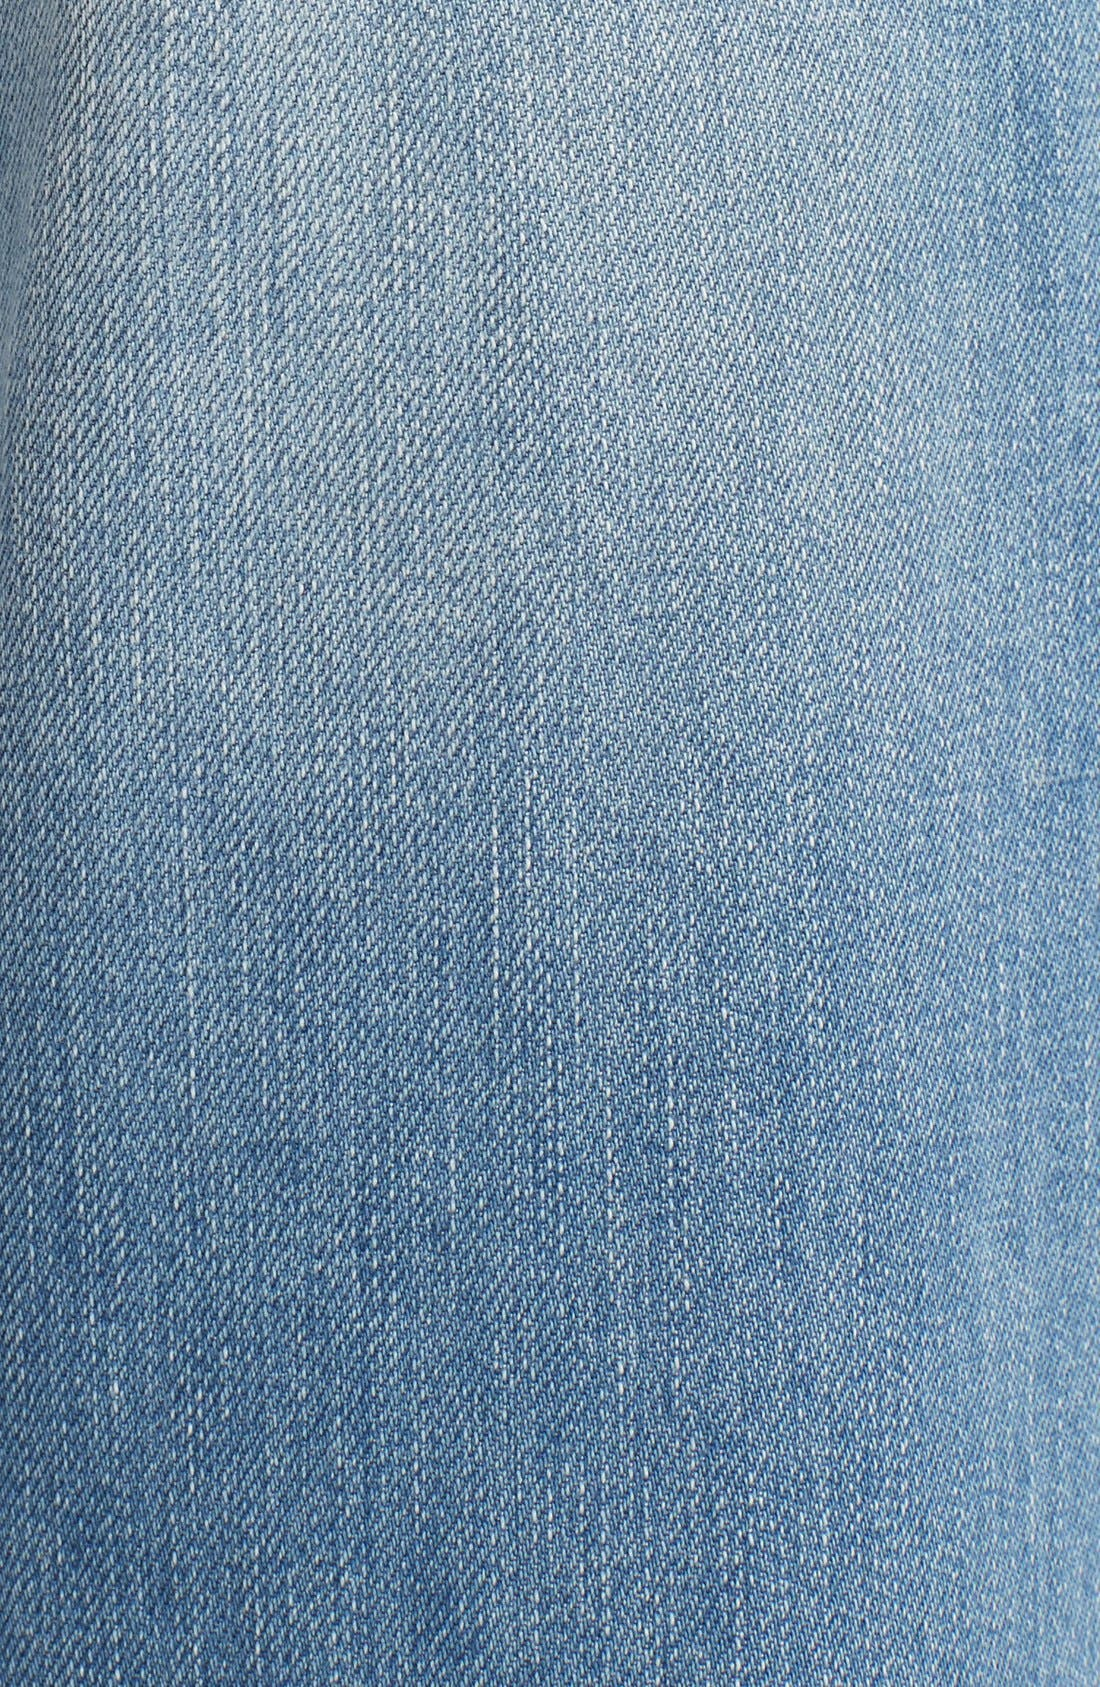 Alternate Image 3  - Valentino Rockstud Boyfriend Jeans